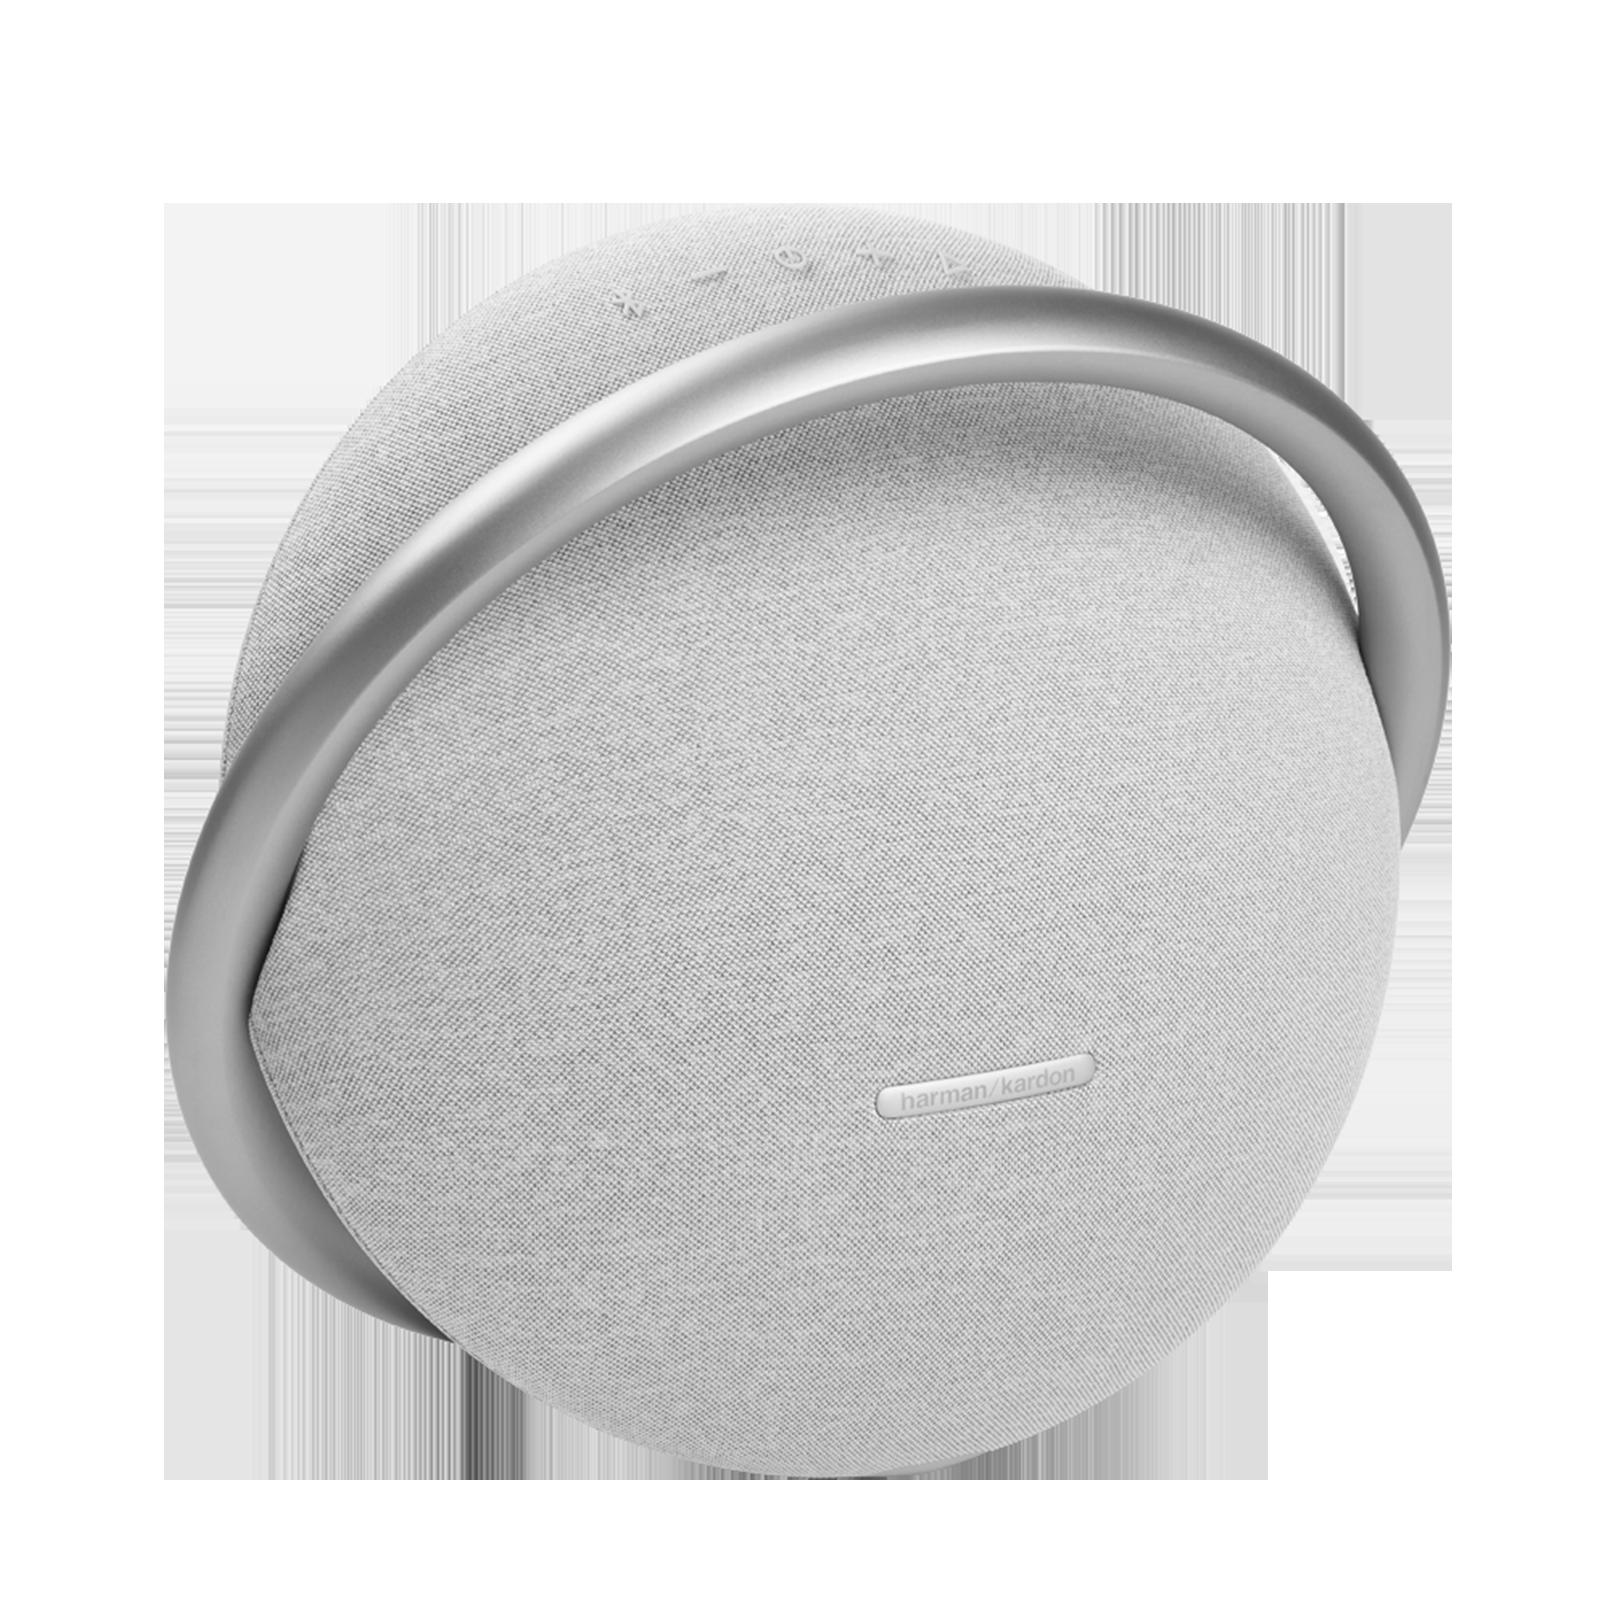 Onyx Studio 7 - Grey - Portable Stereo Bluetooth Speaker - Hero